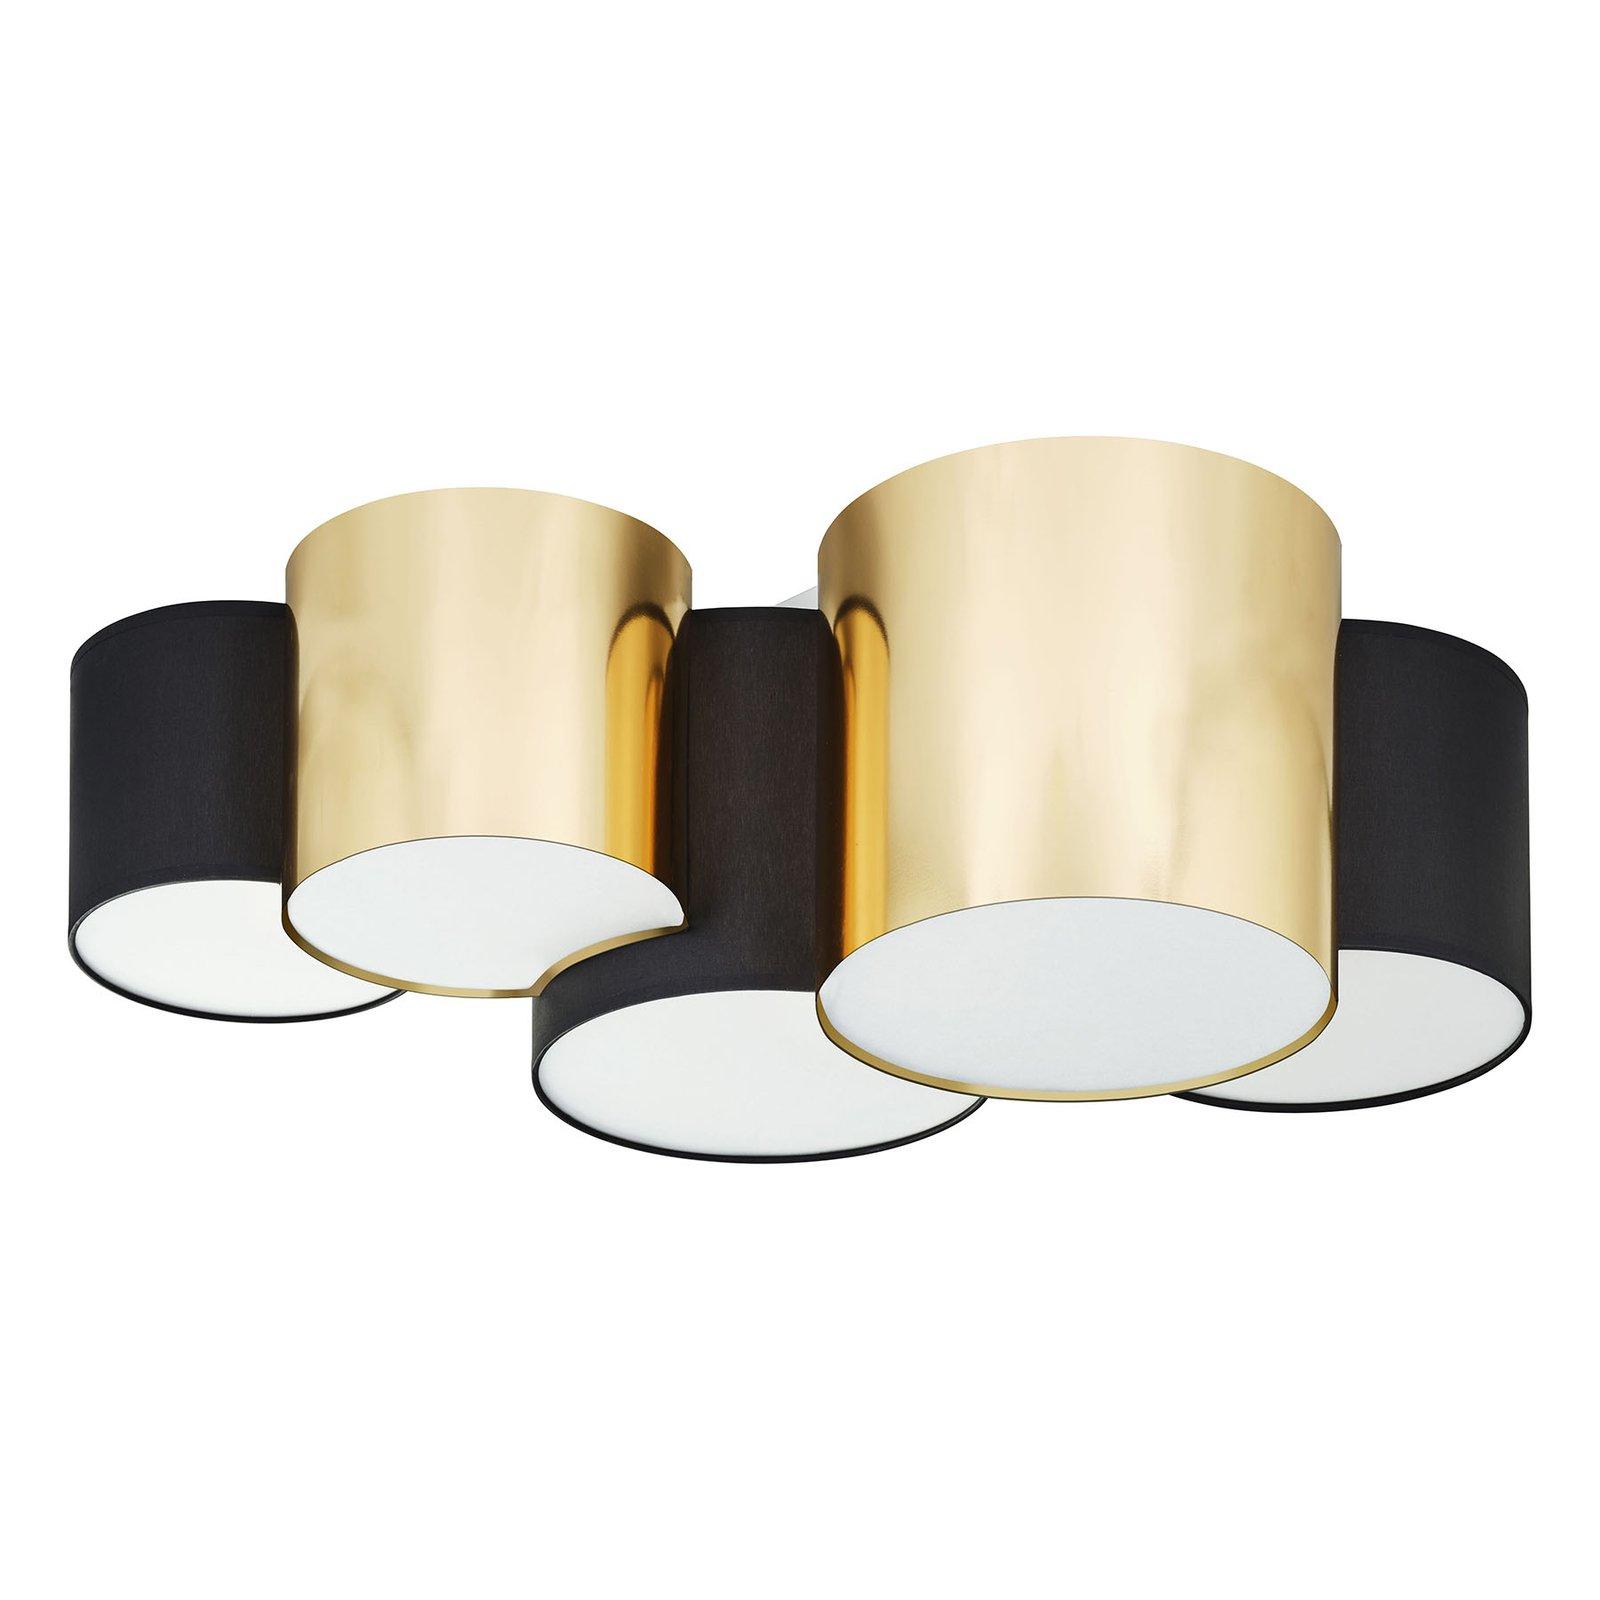 Taklampe Mona 5 lyskilder, svart/gull